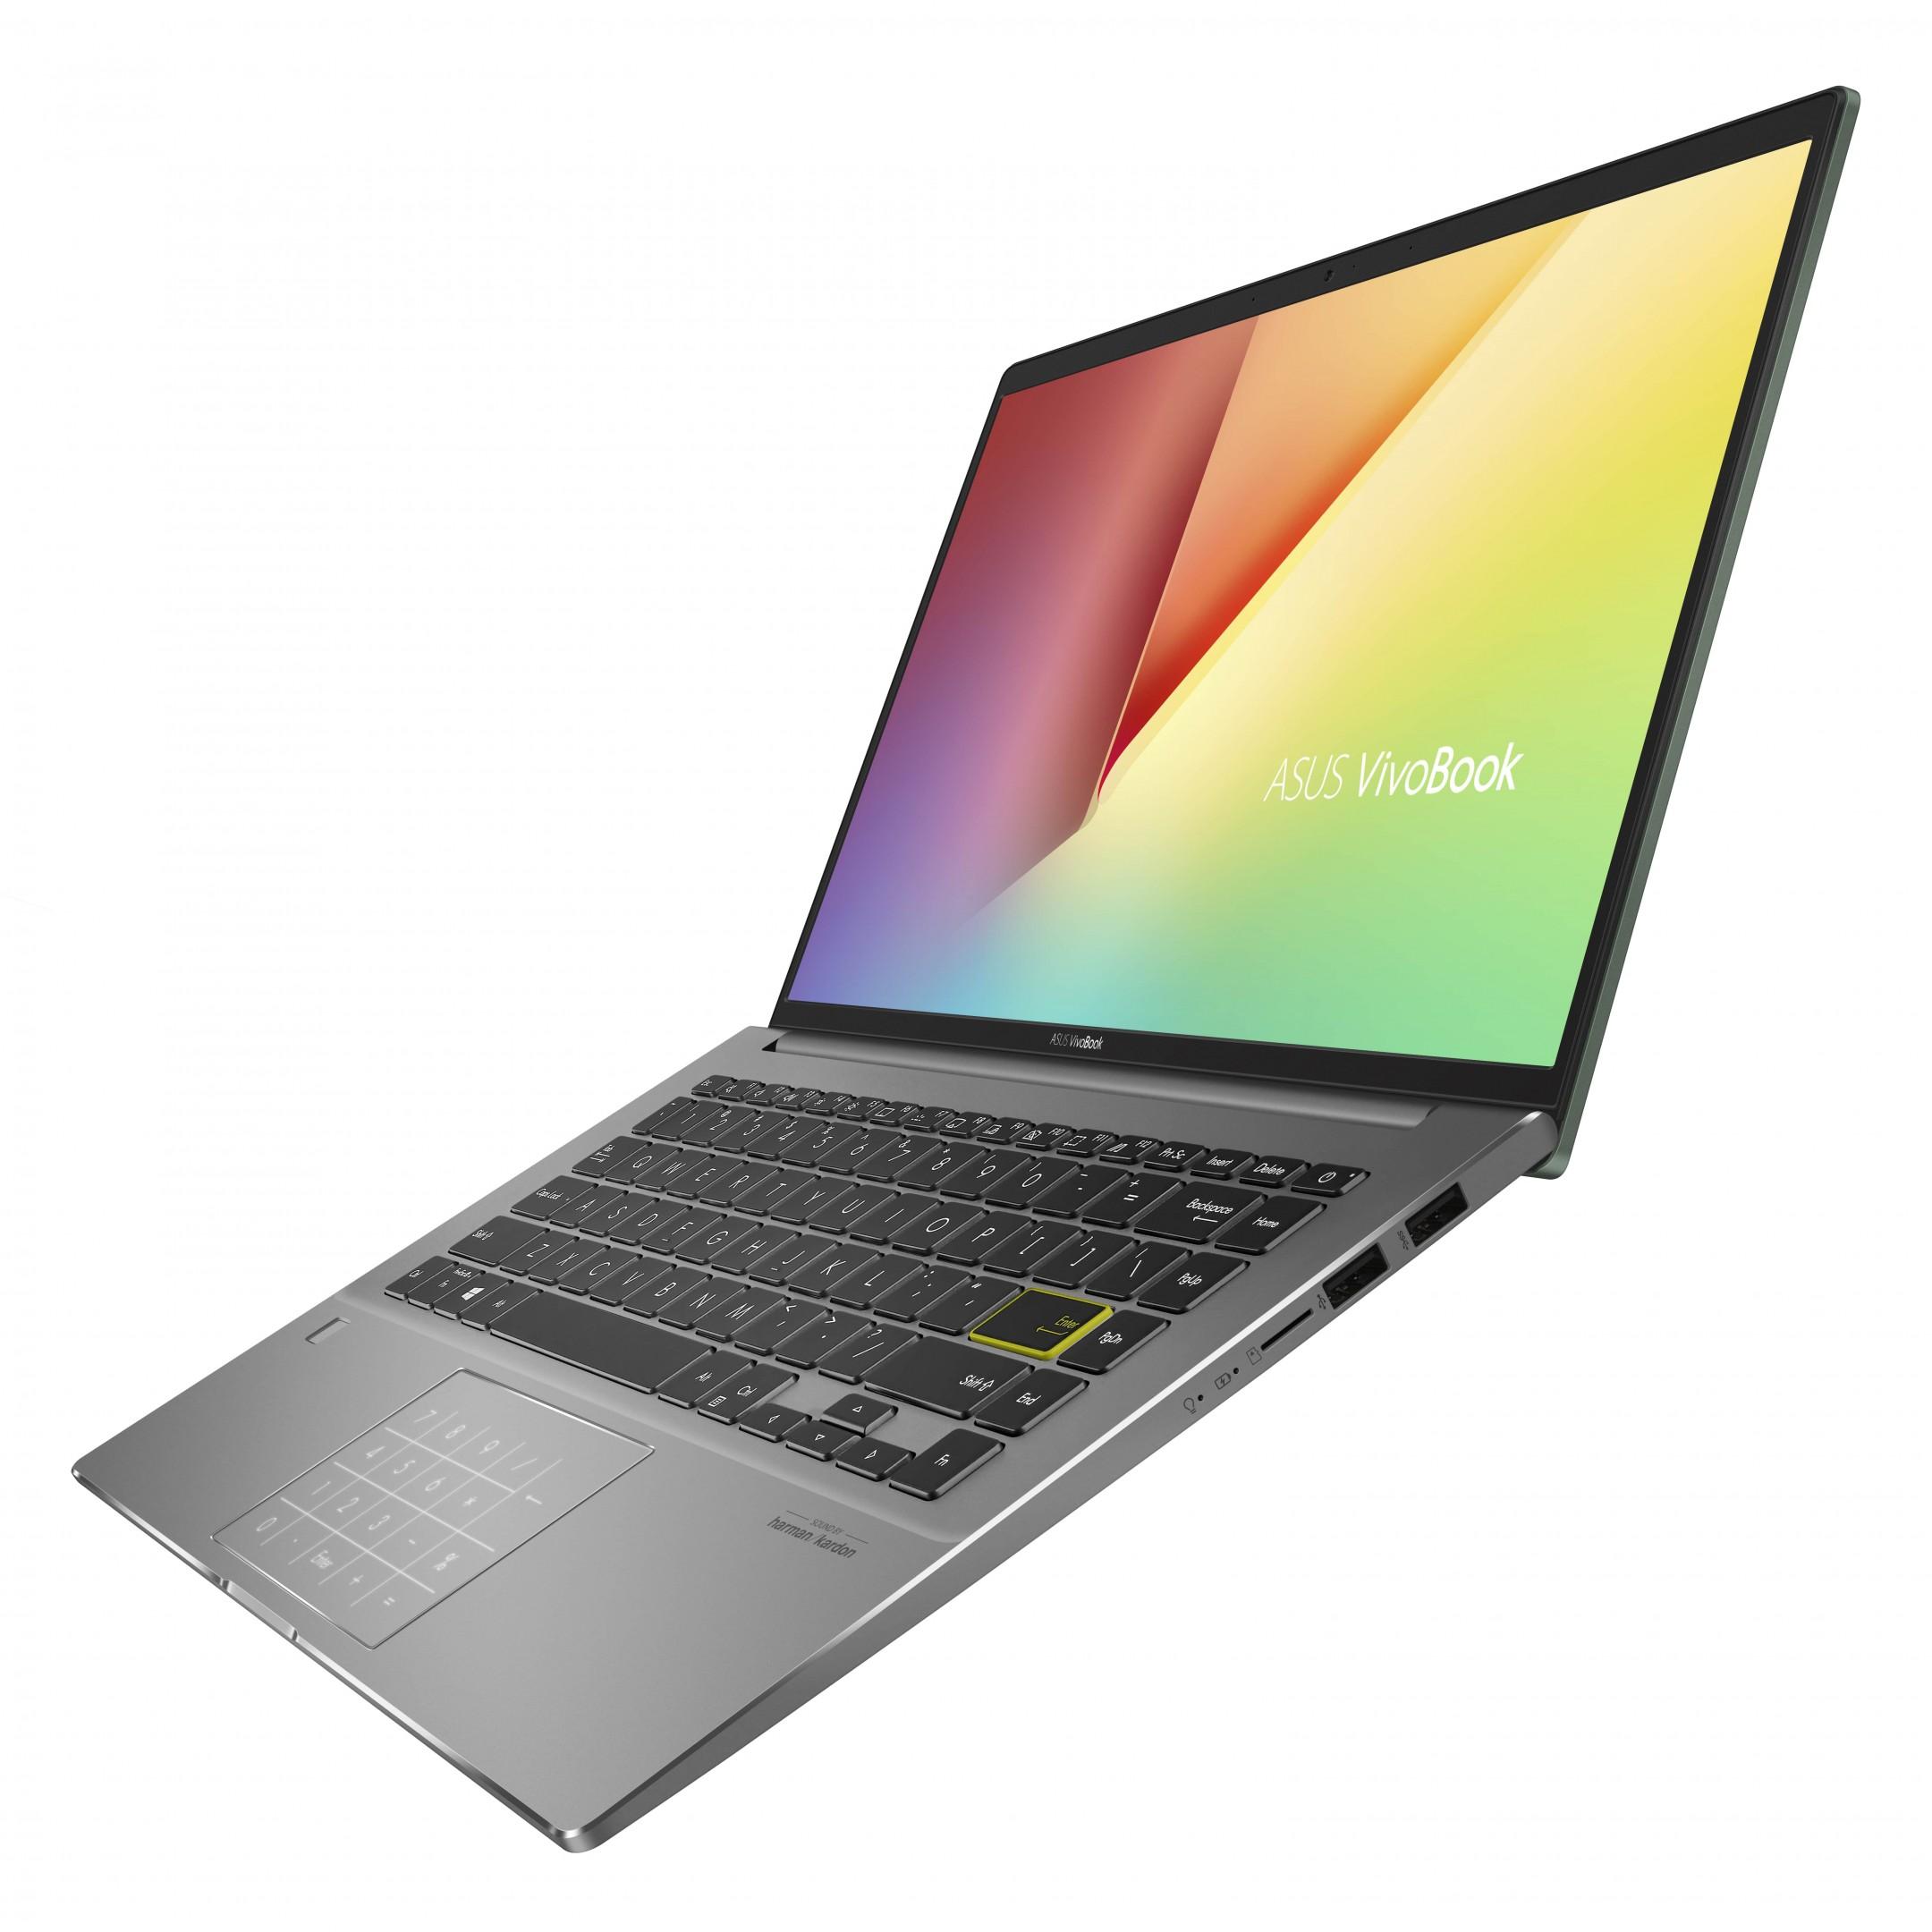 ASUS Vivobook S14 S435